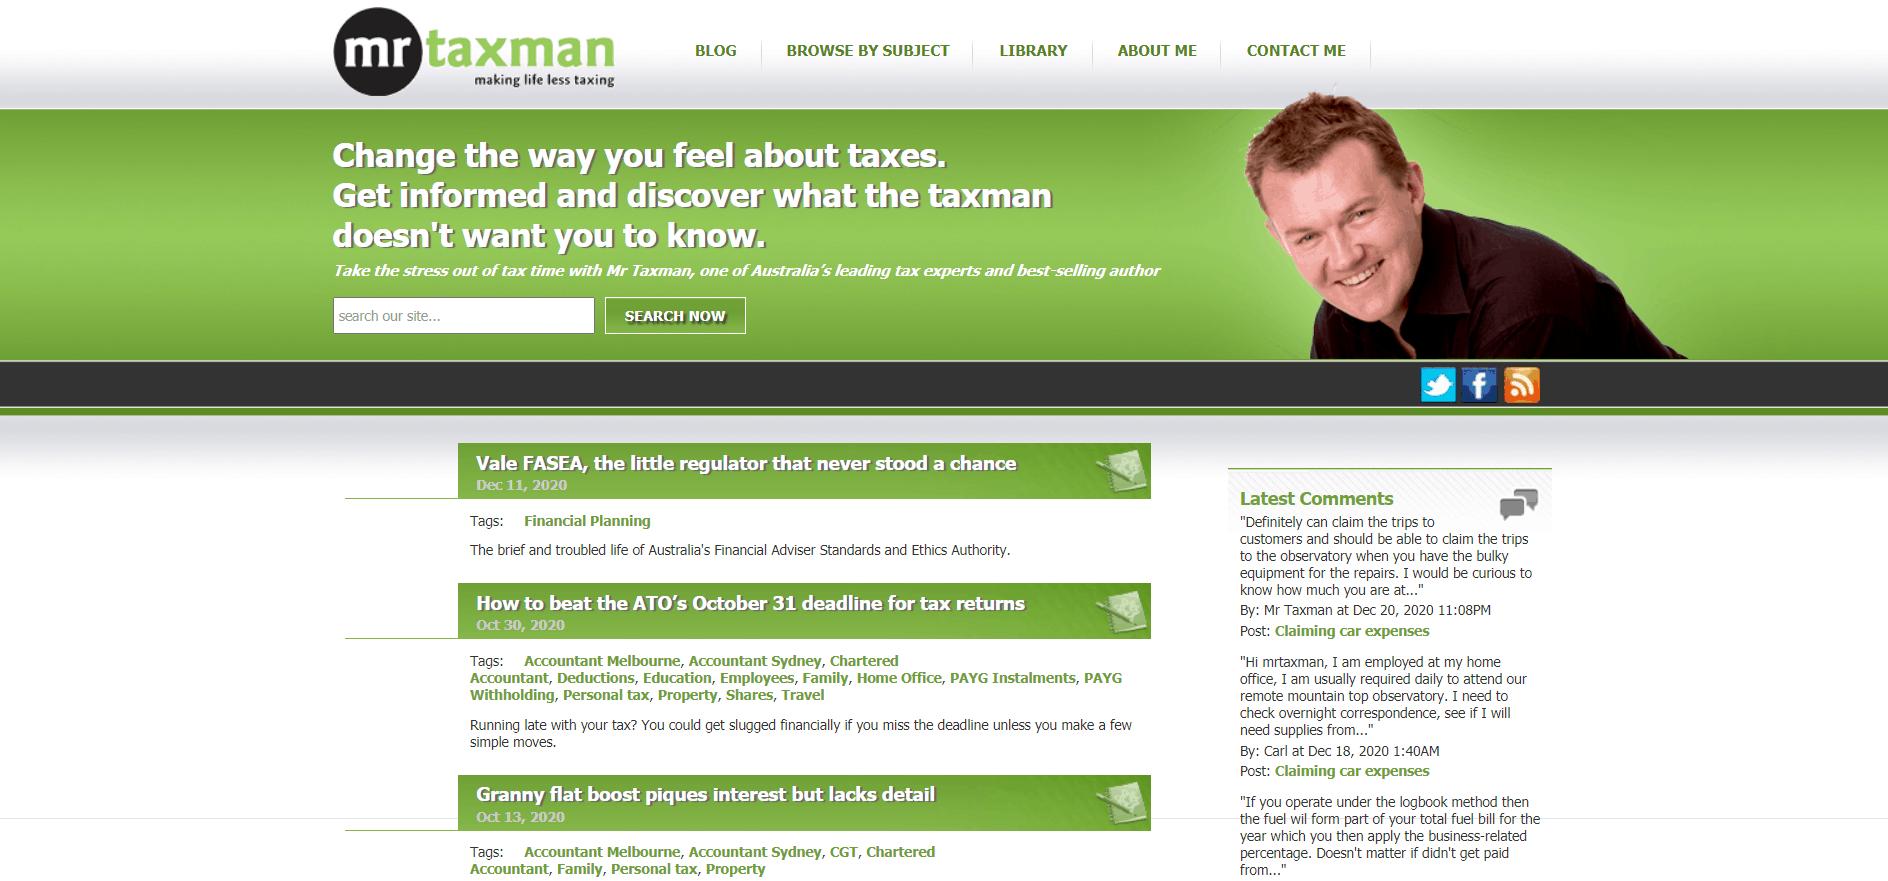 Mr Taxman